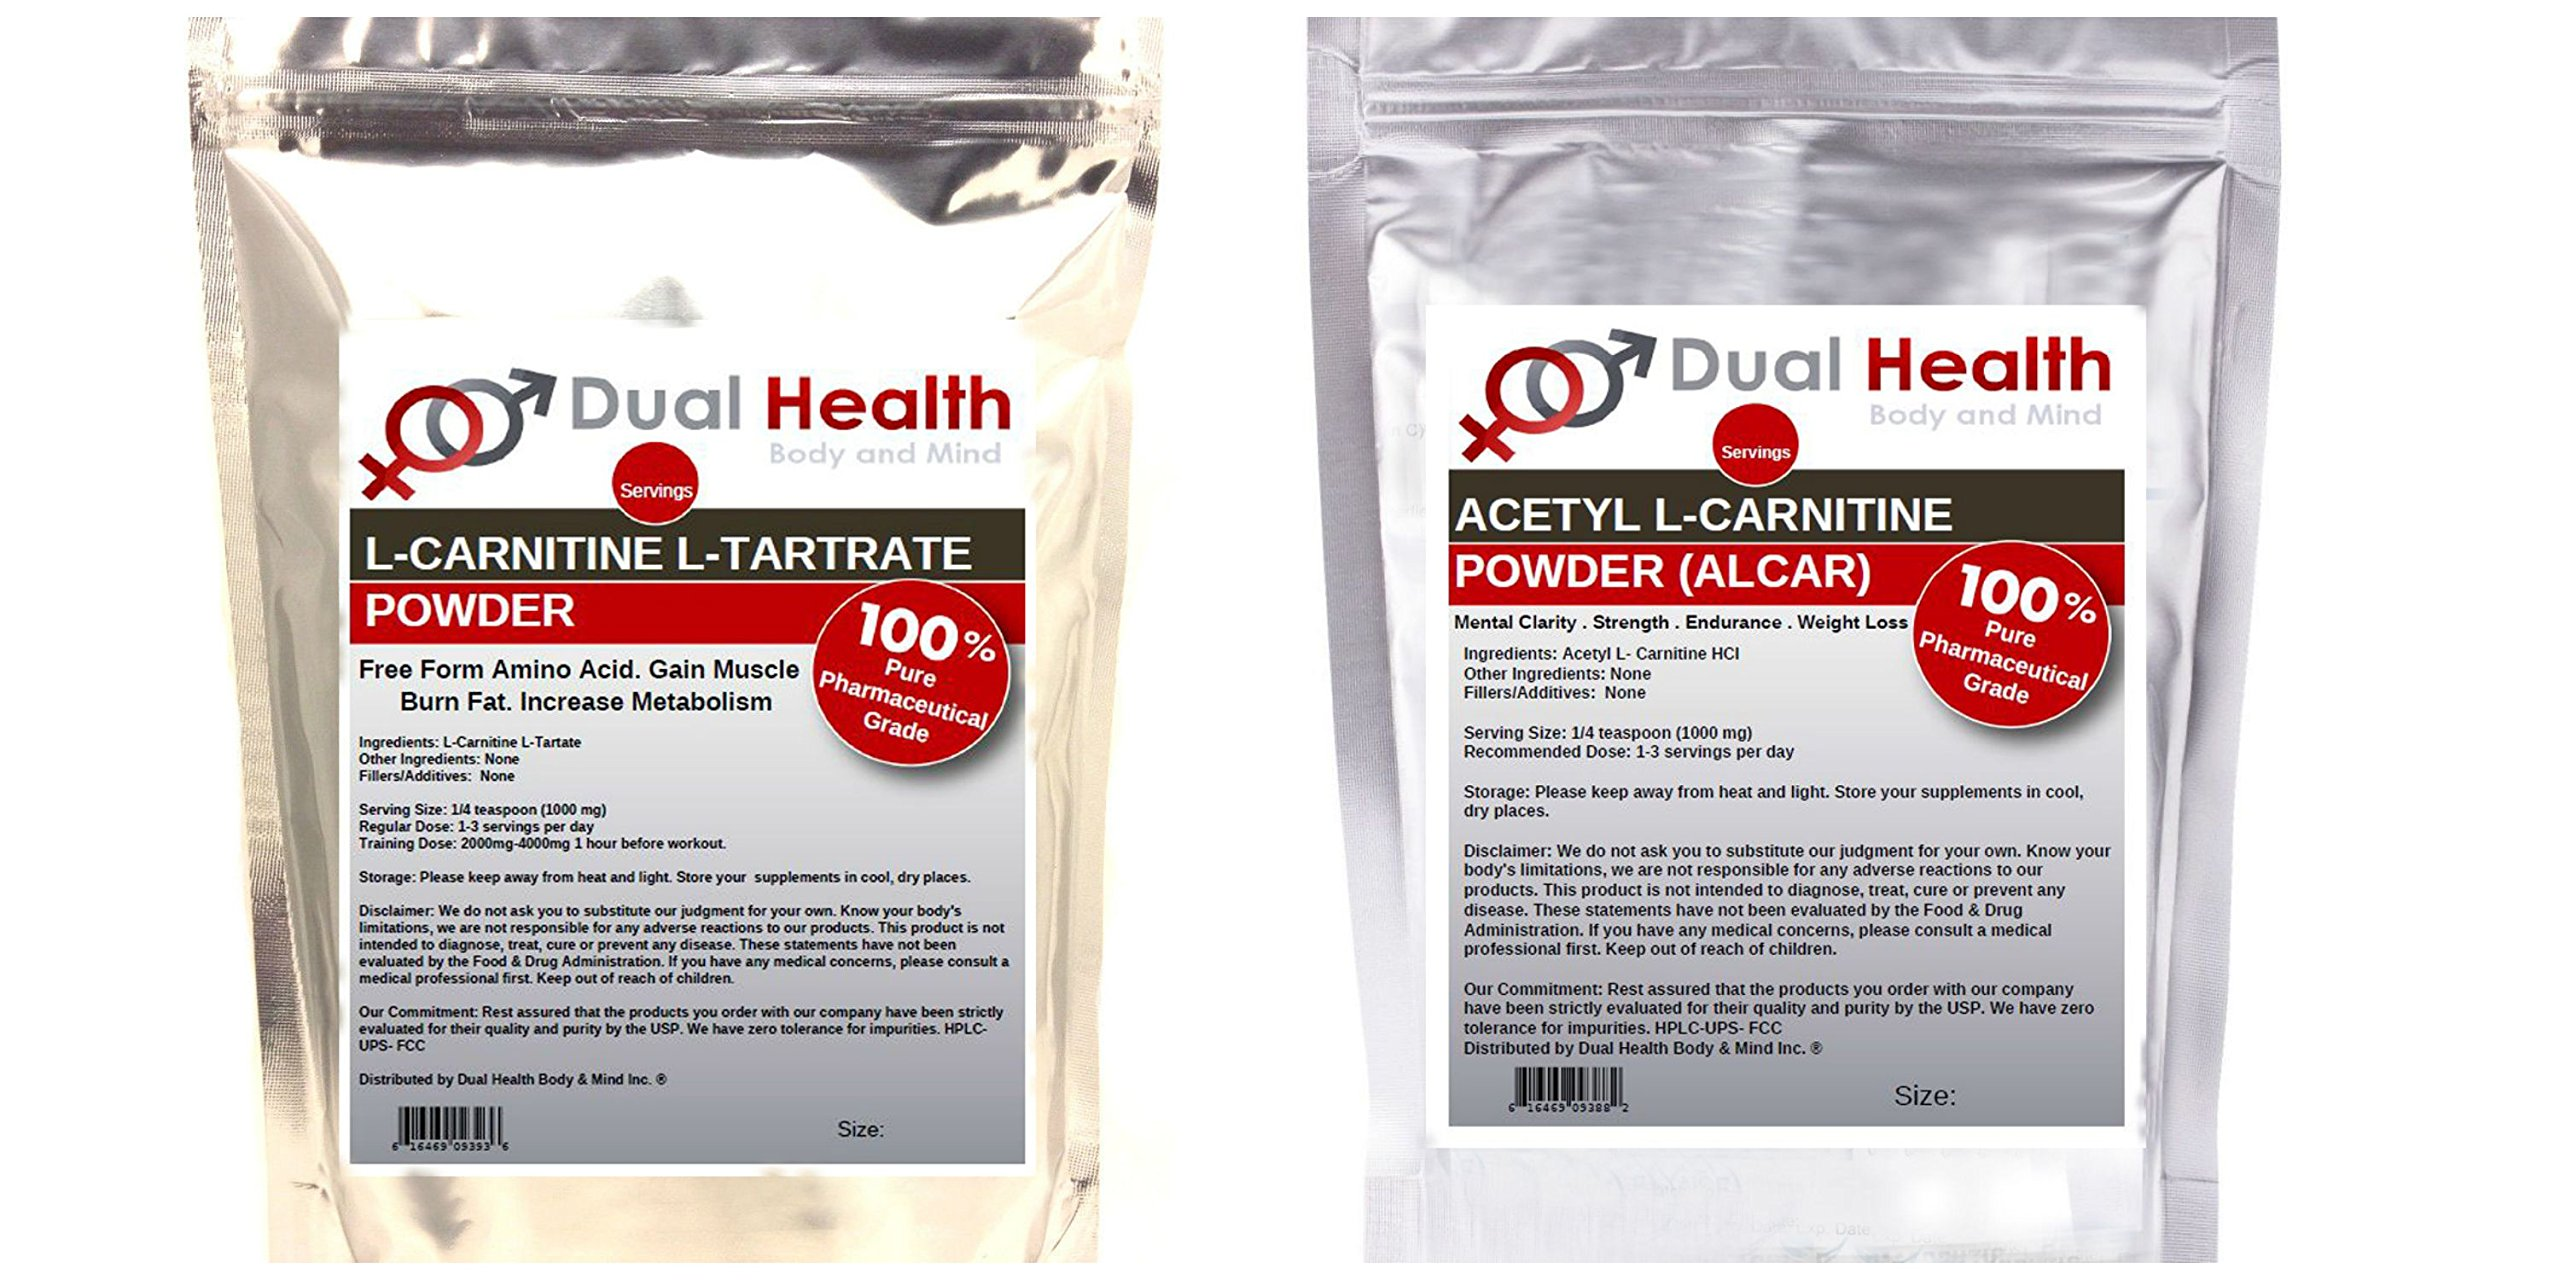 Pure L Carnitine & Acetyl L-Carnitine (ALCAR) Powder (2.5kg x 2) 1 BAG OF EACH